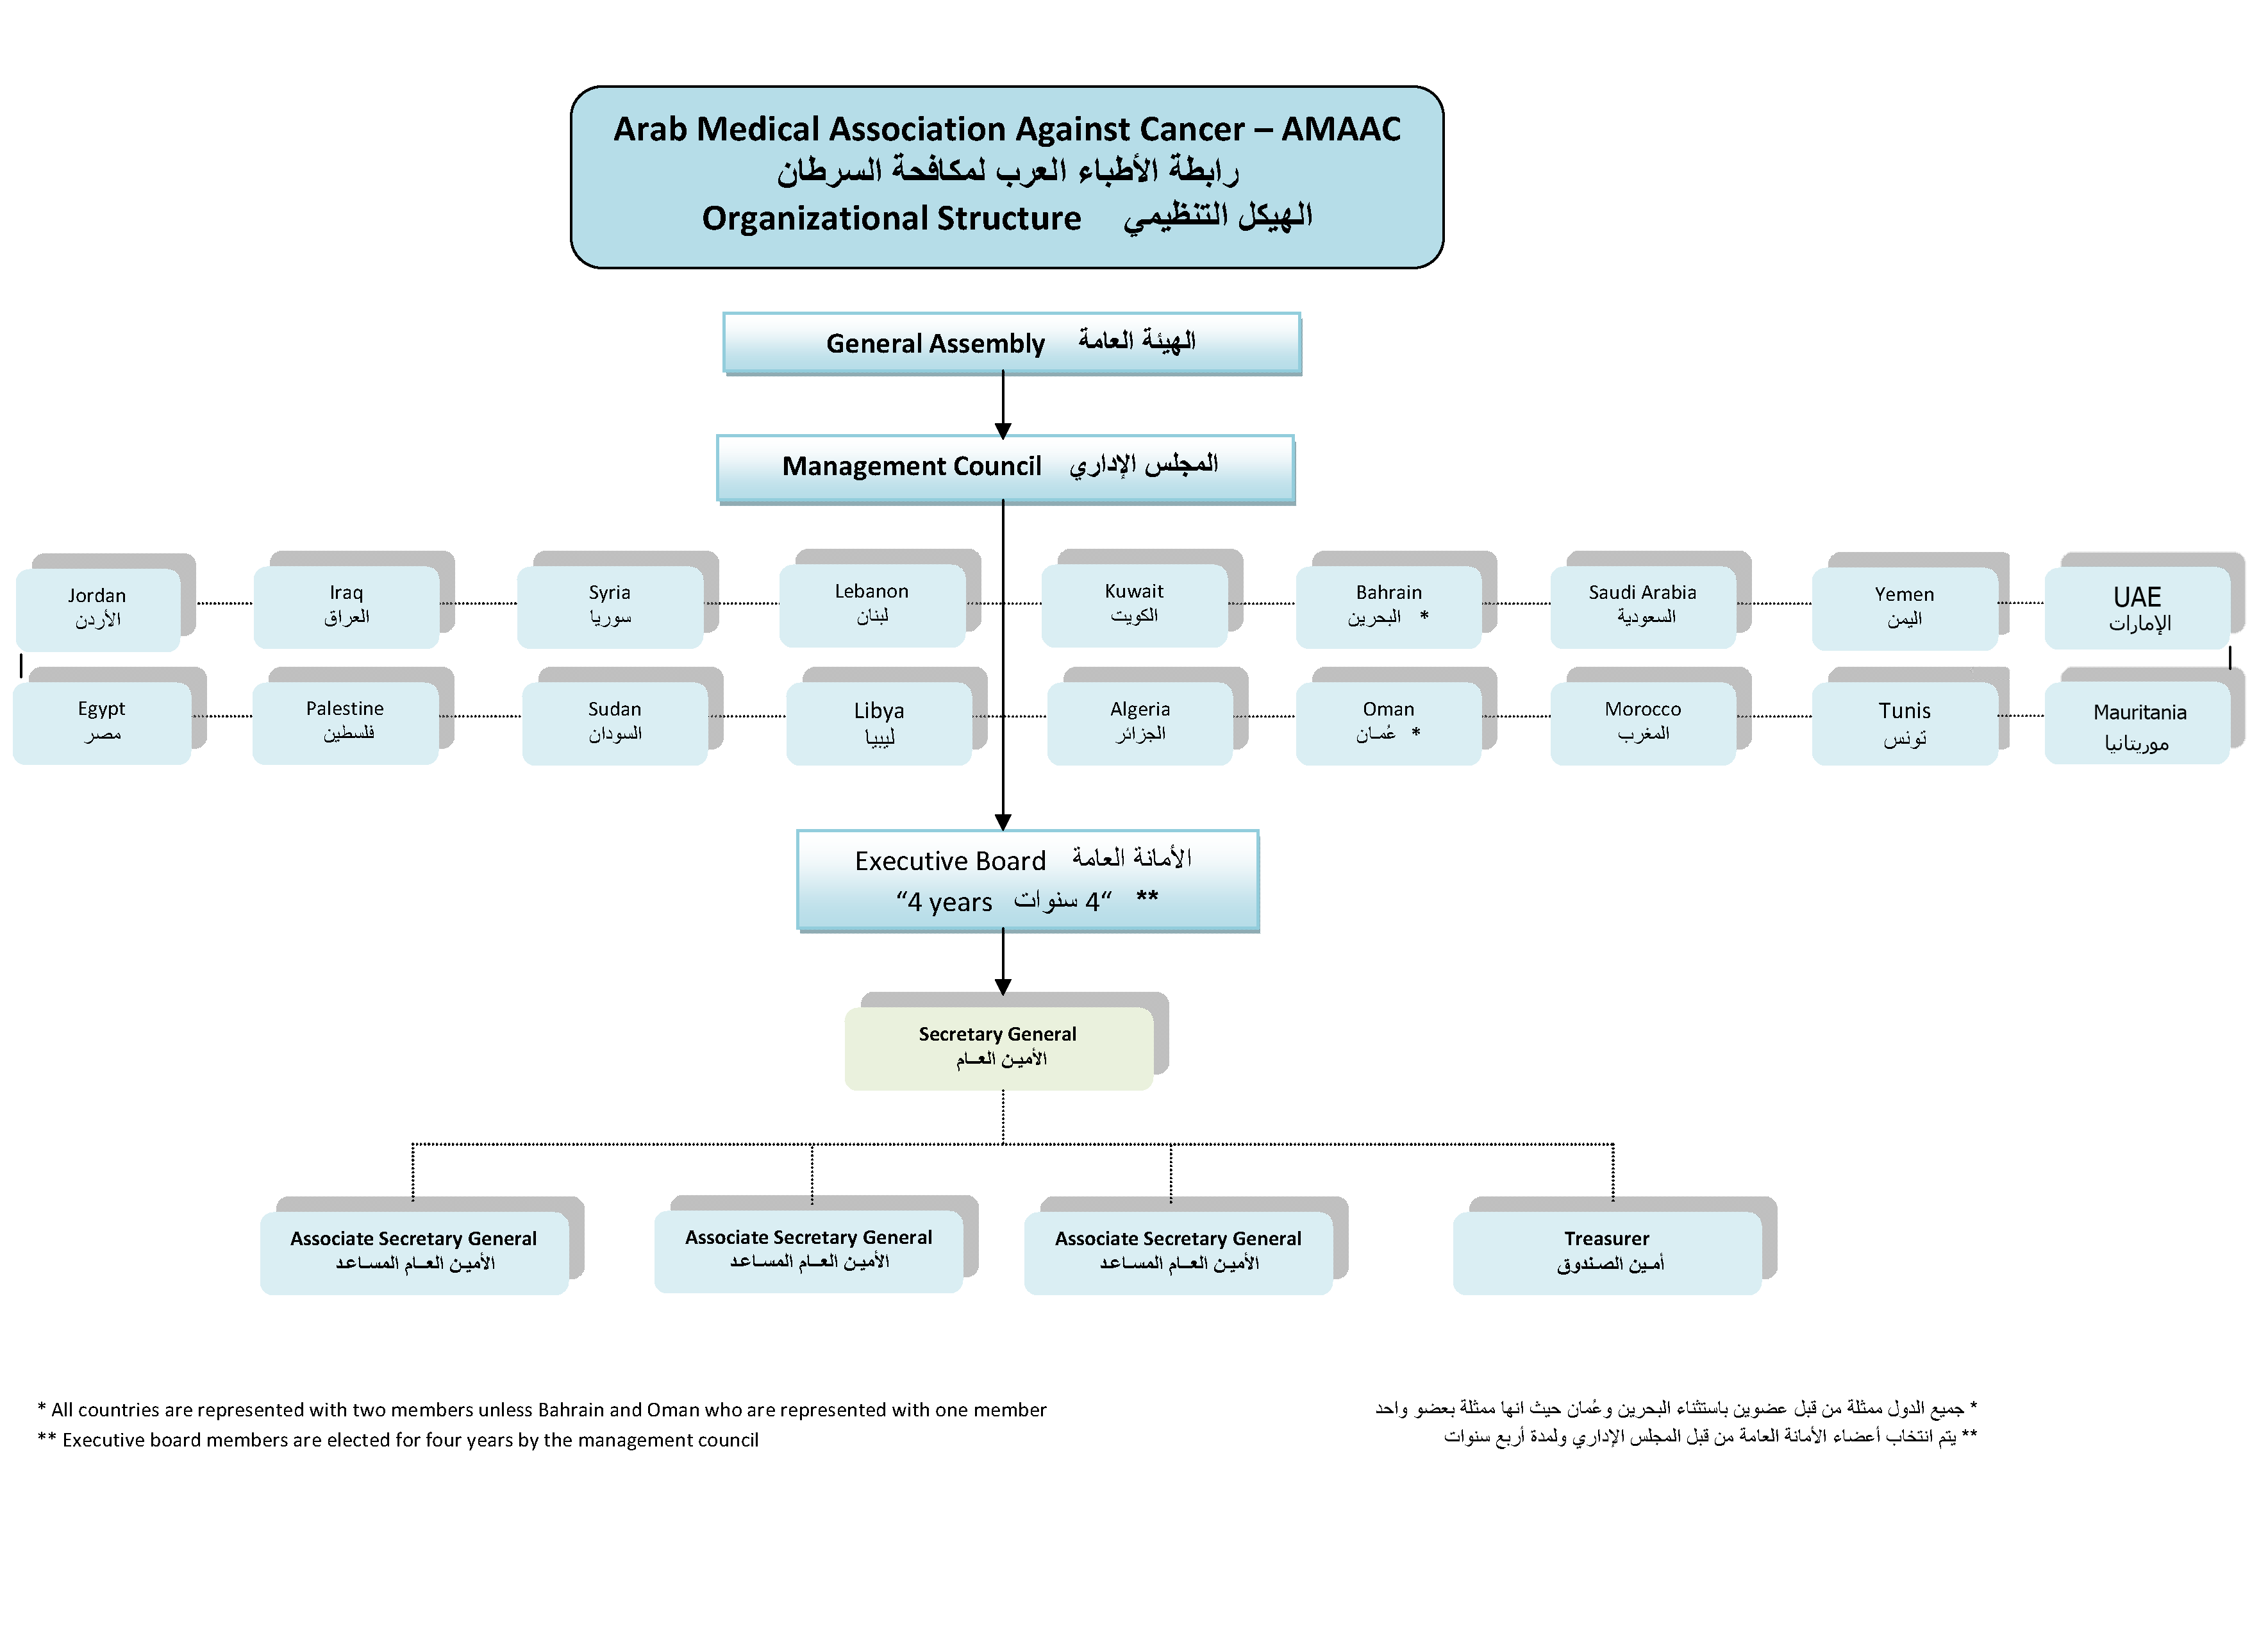 amaac organizational structure - World Vision Organizational Structure